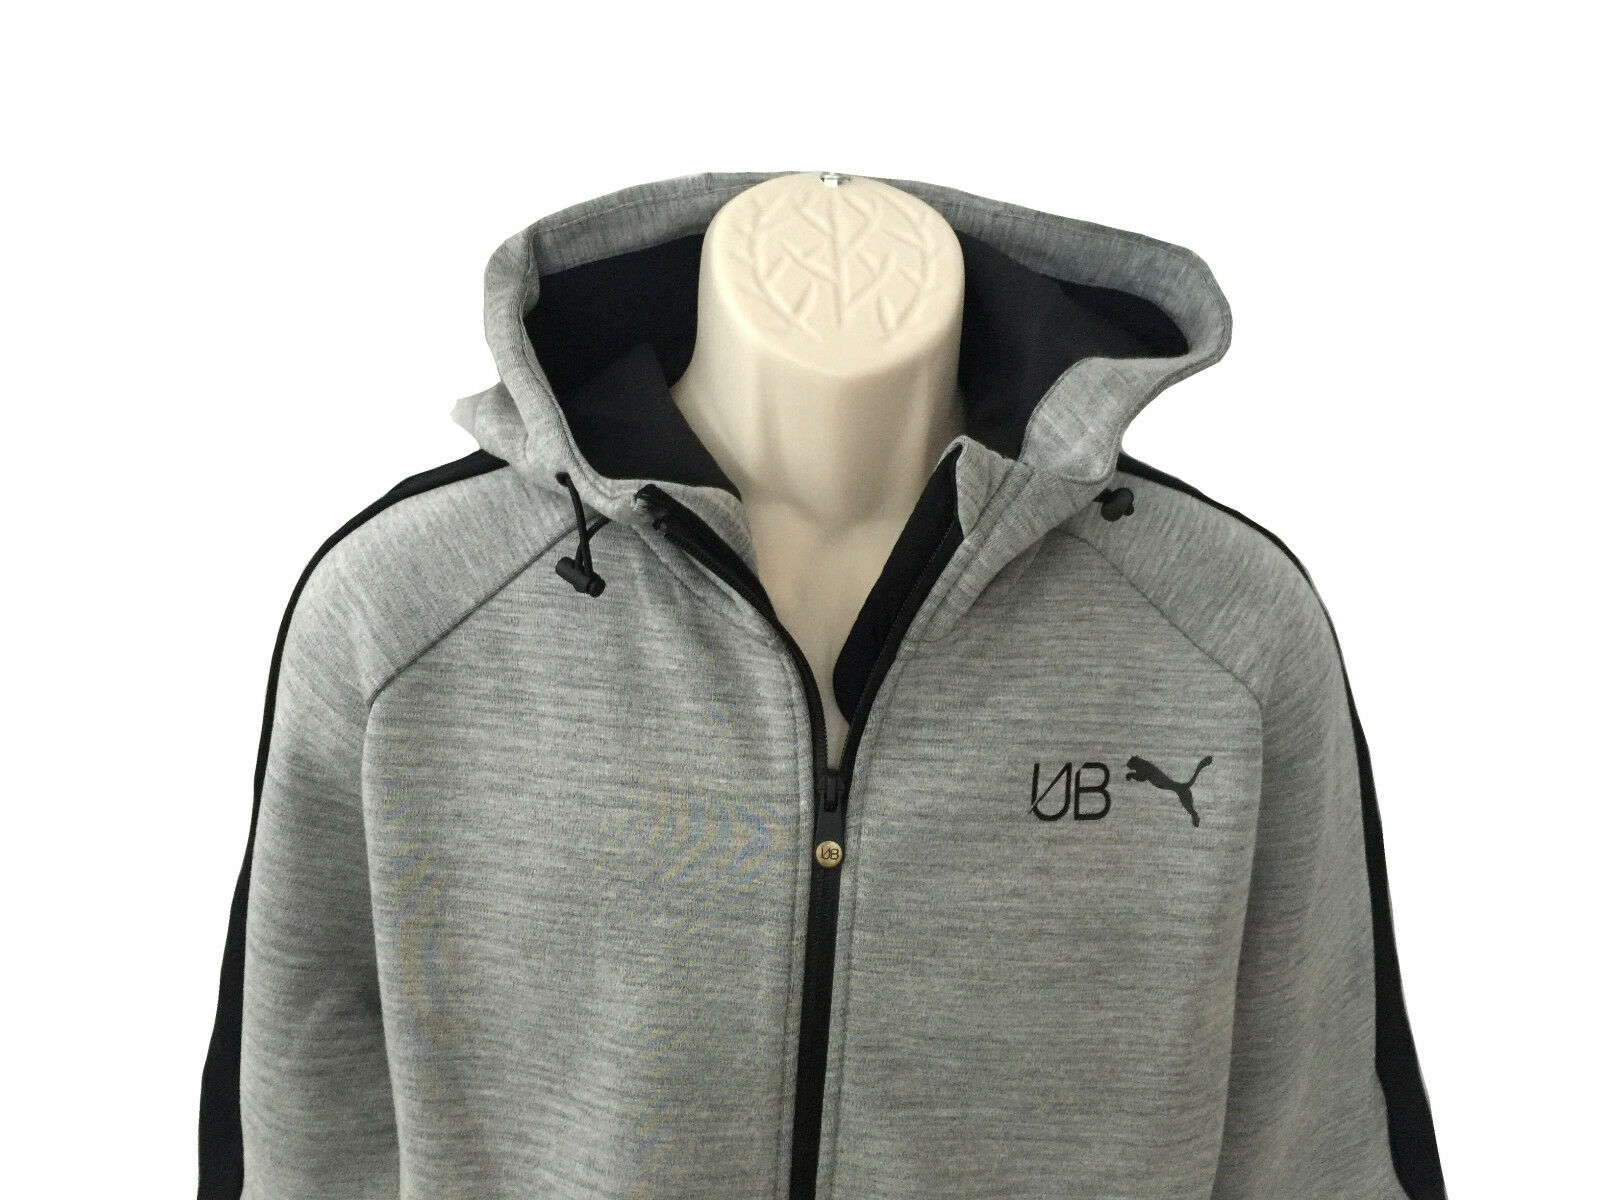 NEU Herrenmode Sport Kapuzen Sweater grau meliert Gr.XL von PUMA